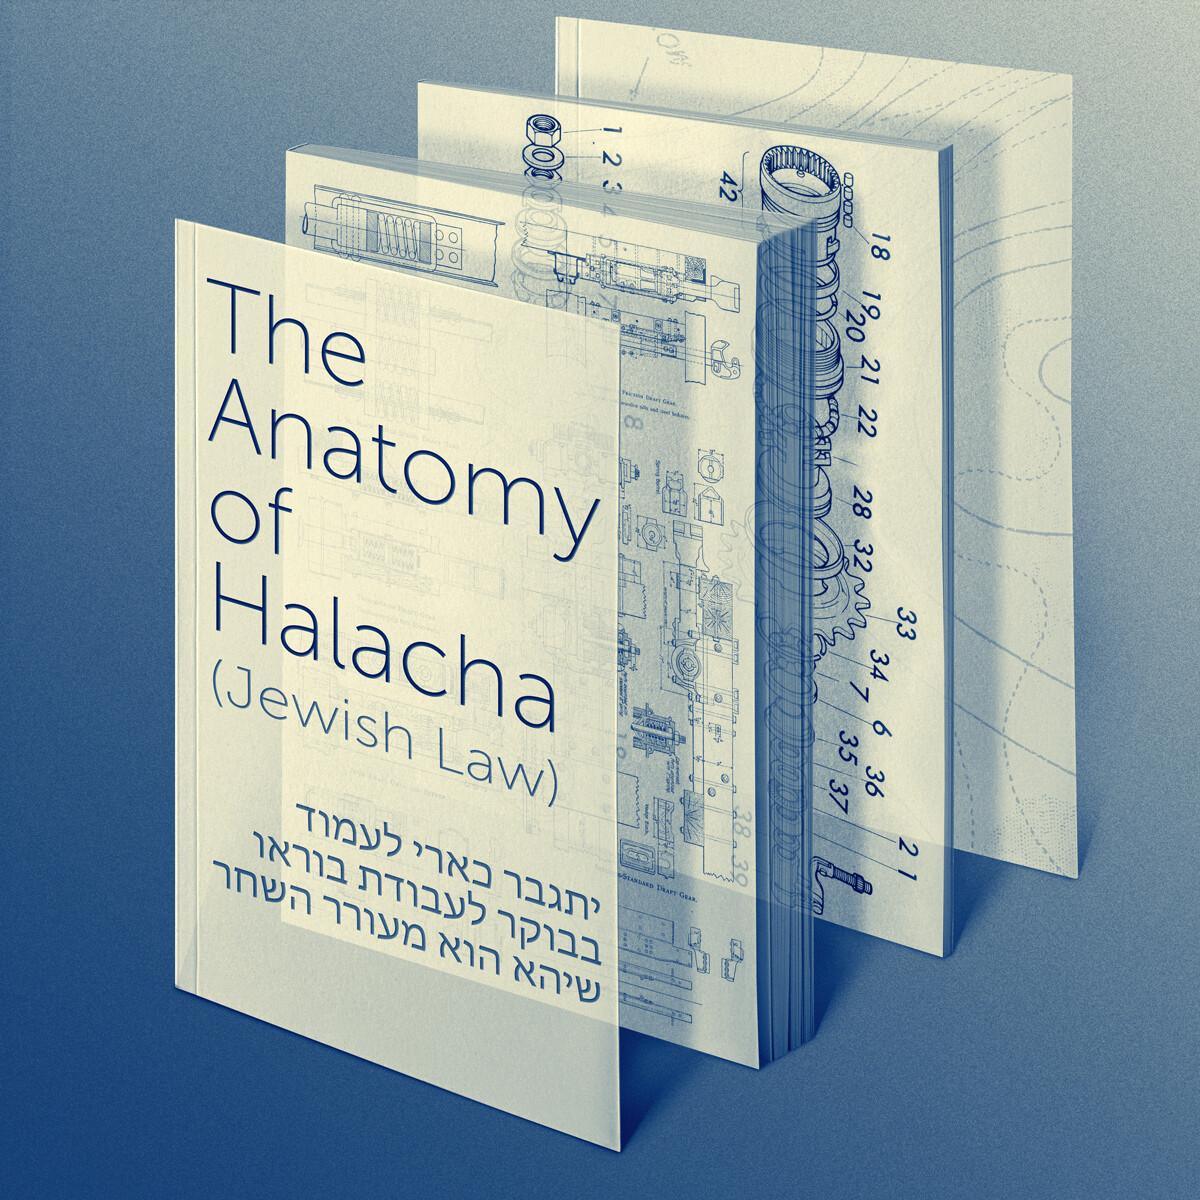 The Anatomy of Halacha